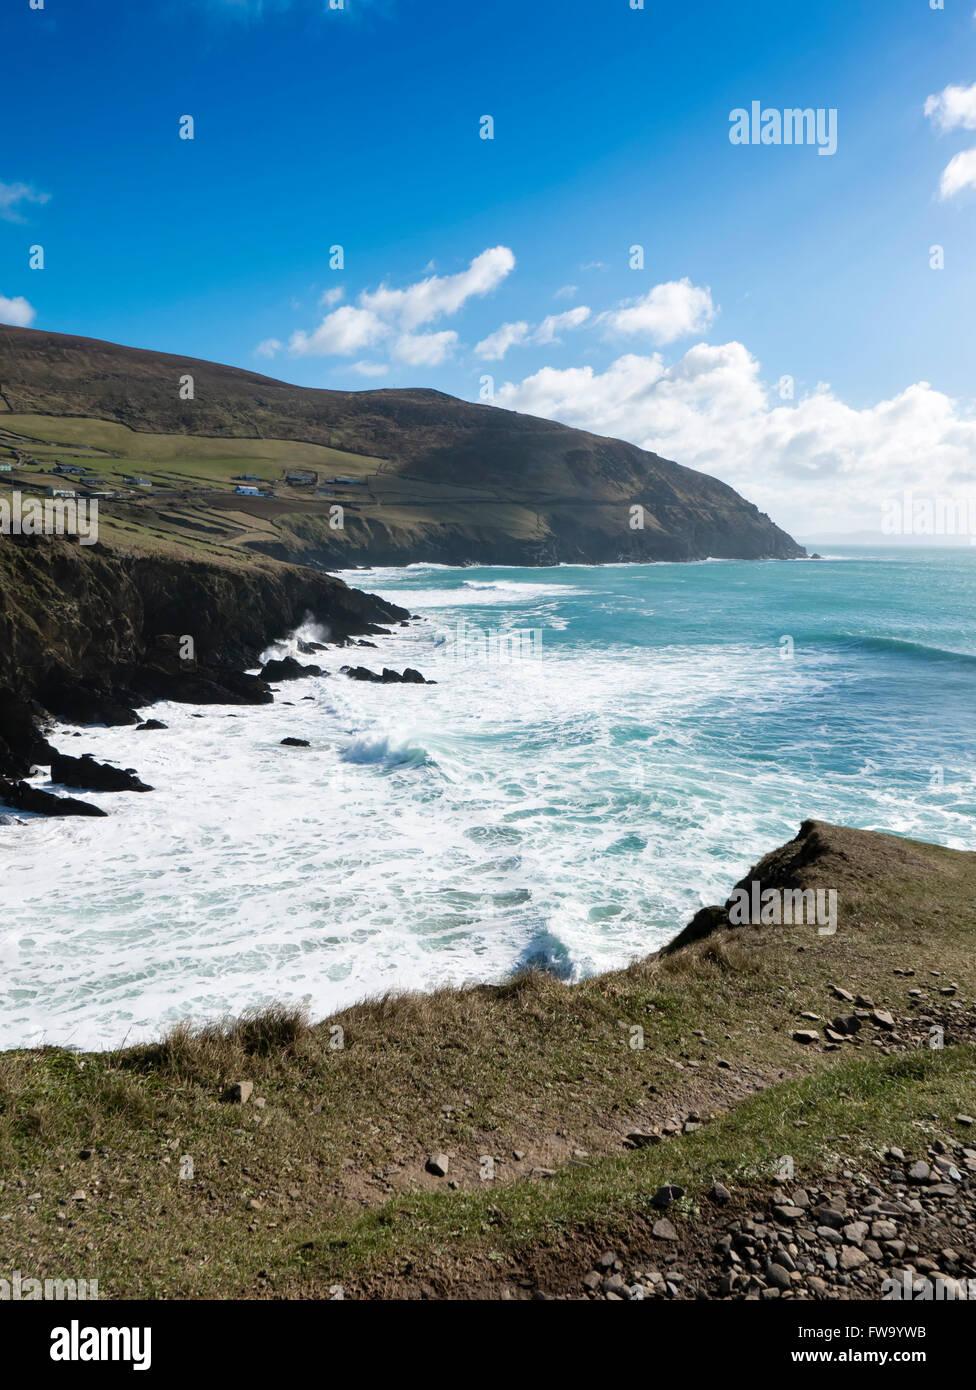 Crashing waves at Dunquin beach on the Slea Head Drive, Dingle Peninsula County Kerry, Republic of Ireland. Stock Photo